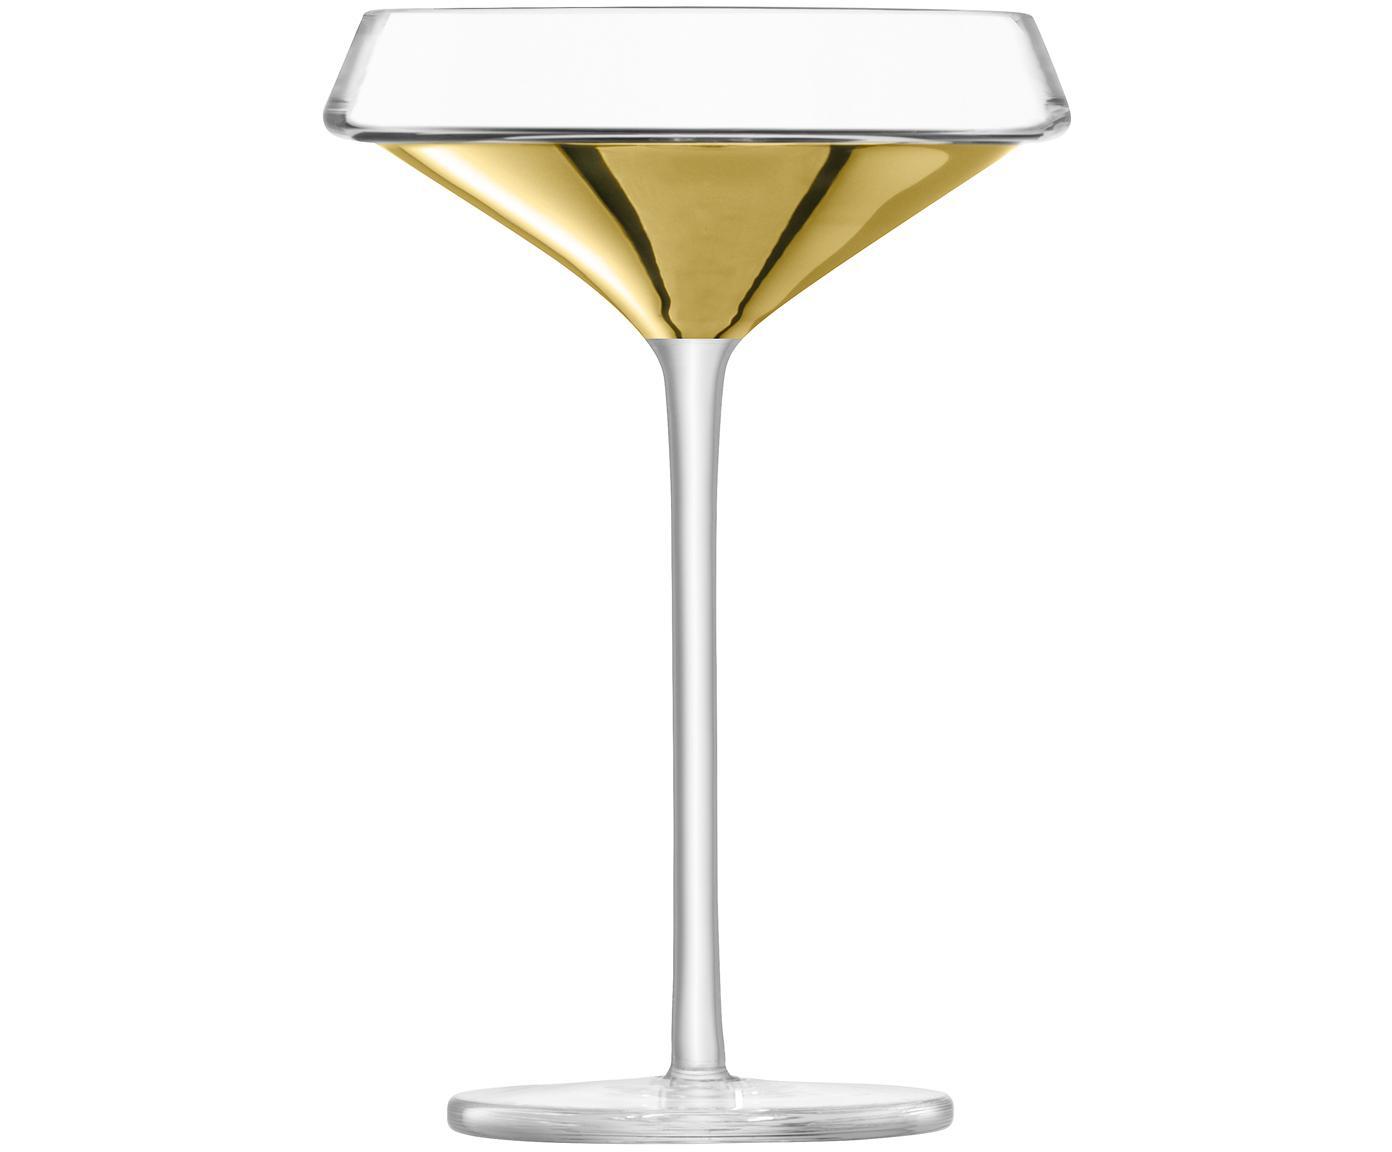 Mondgeblazen champagneglazen Space met gouden detail, 2-delig, Glas, Transparant, goudkleurig, Ø 12 x H 18 cm